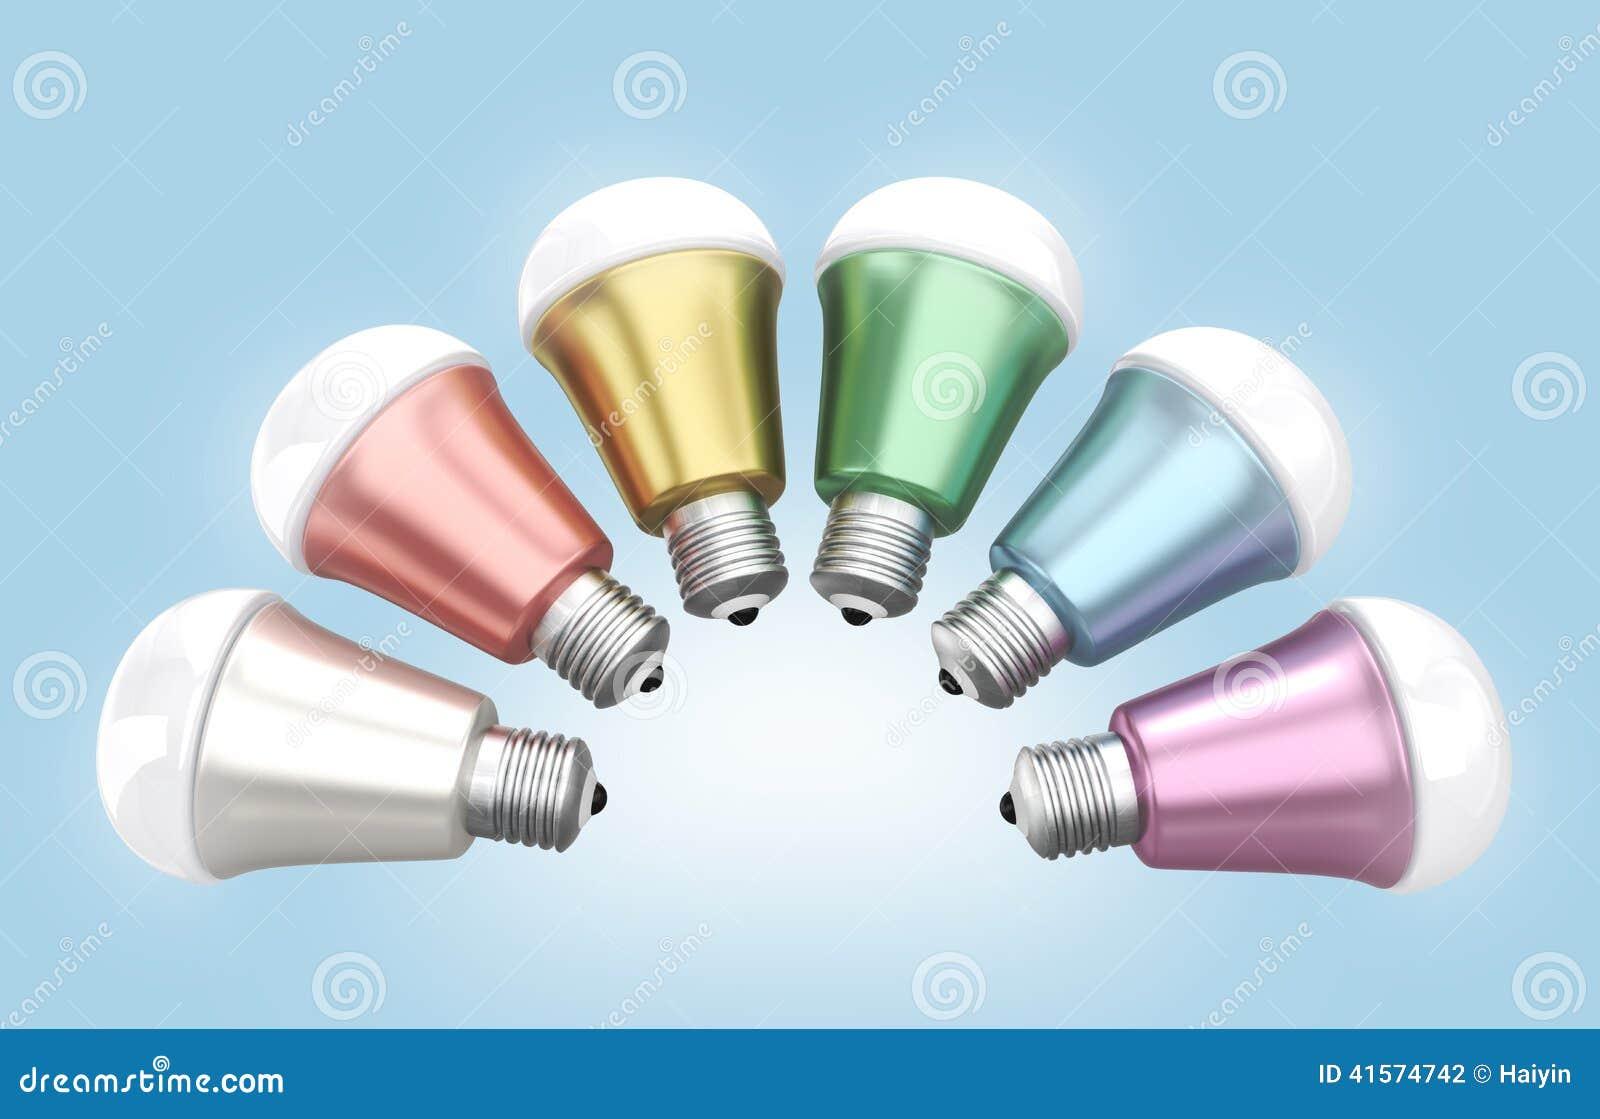 Energy Efficient Led Light Bulbs Arranged In Fan Shape Stock Illustration Image 41574742